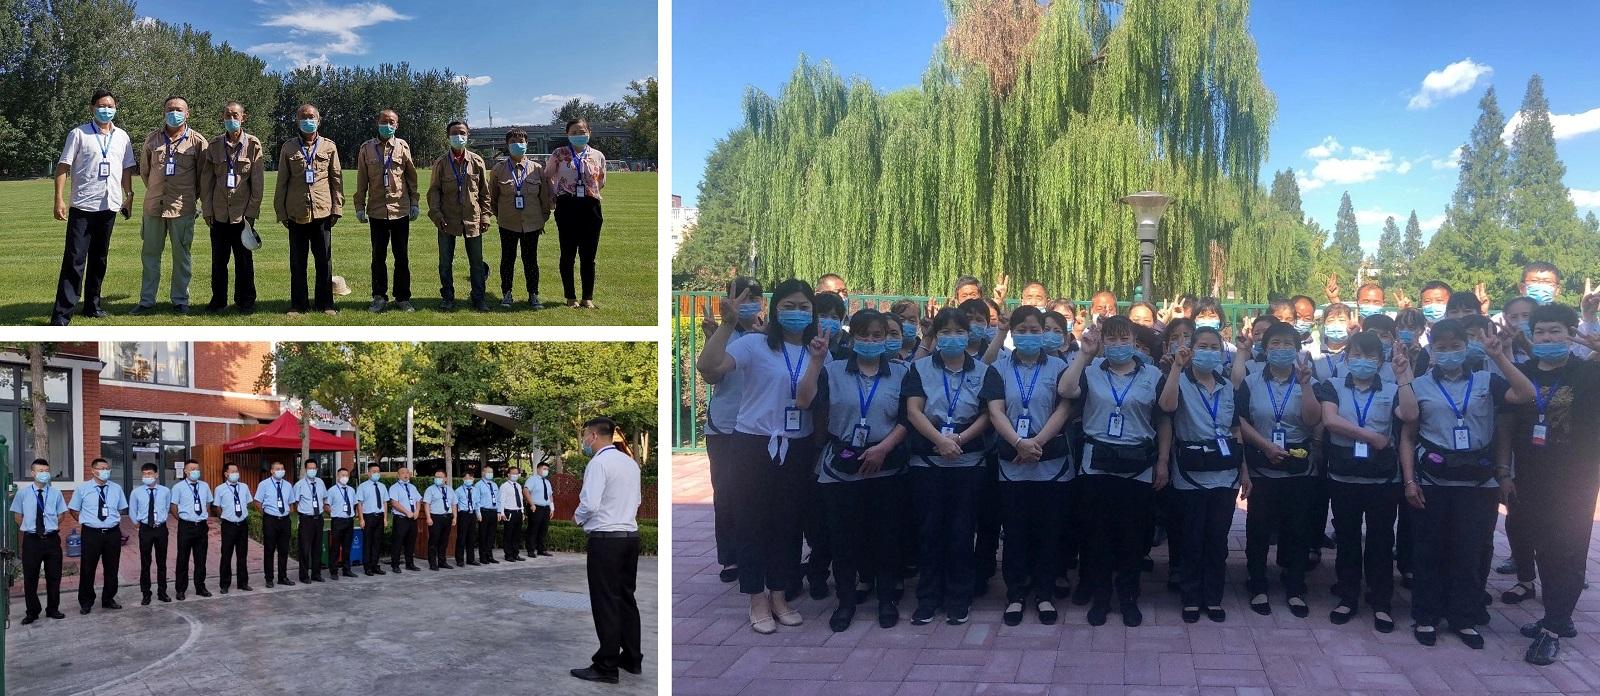 DCB Operations Team - British International School in Beijing